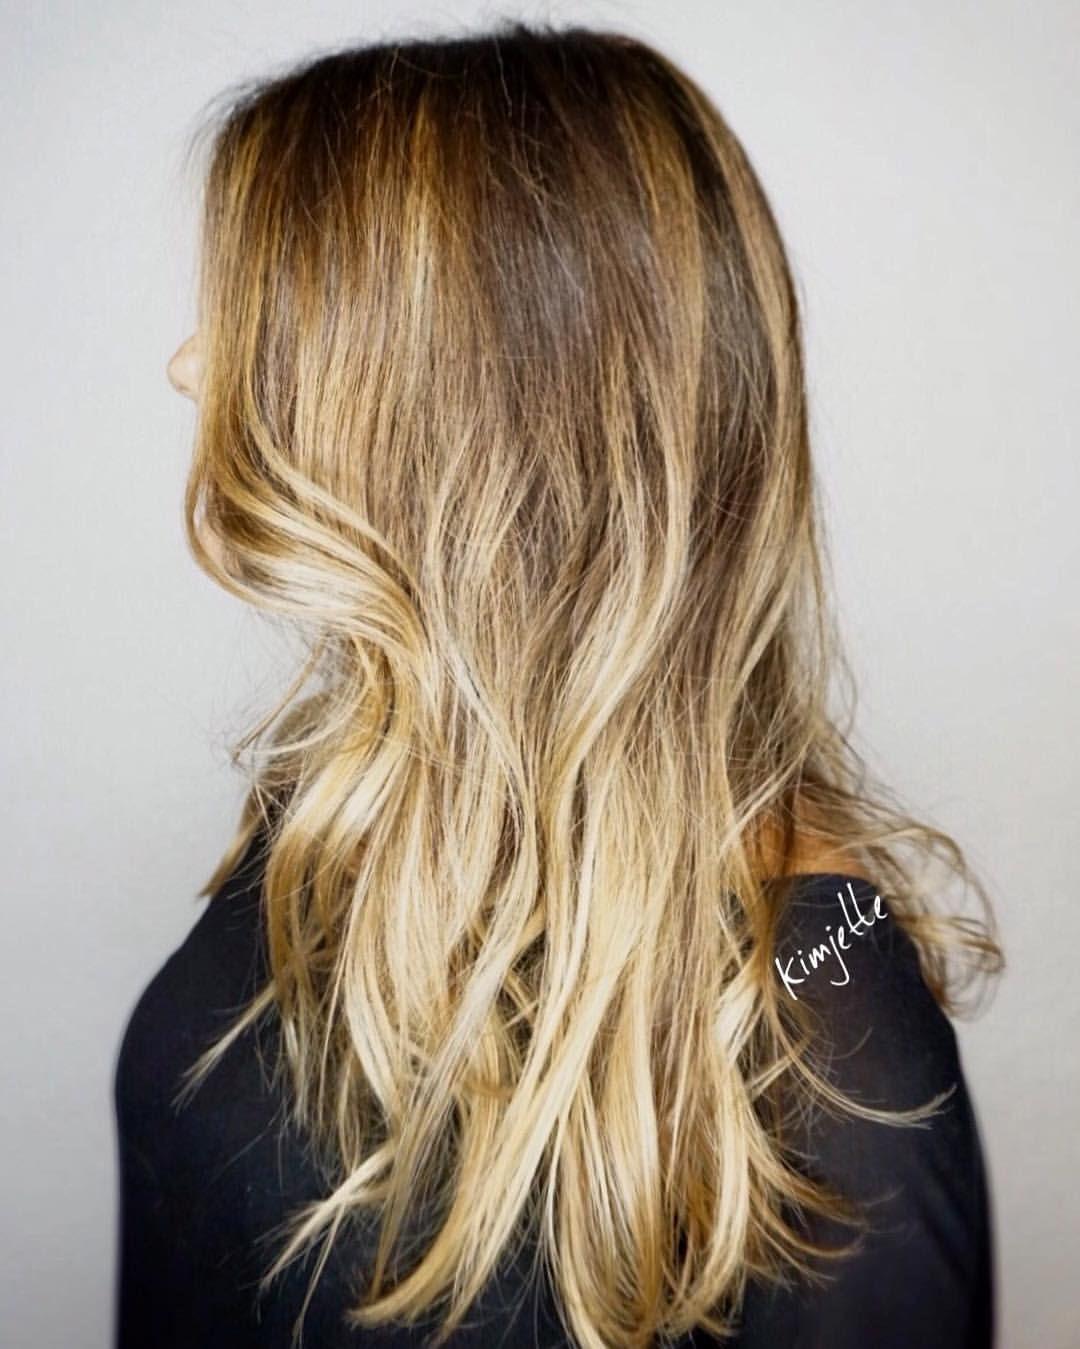 BLONDE BALAYAGE OMBRÉ #hairbykimjette #balayage #balayageombre @kimjettehair (at Kim Jette- Redken Certified Hair colorist)